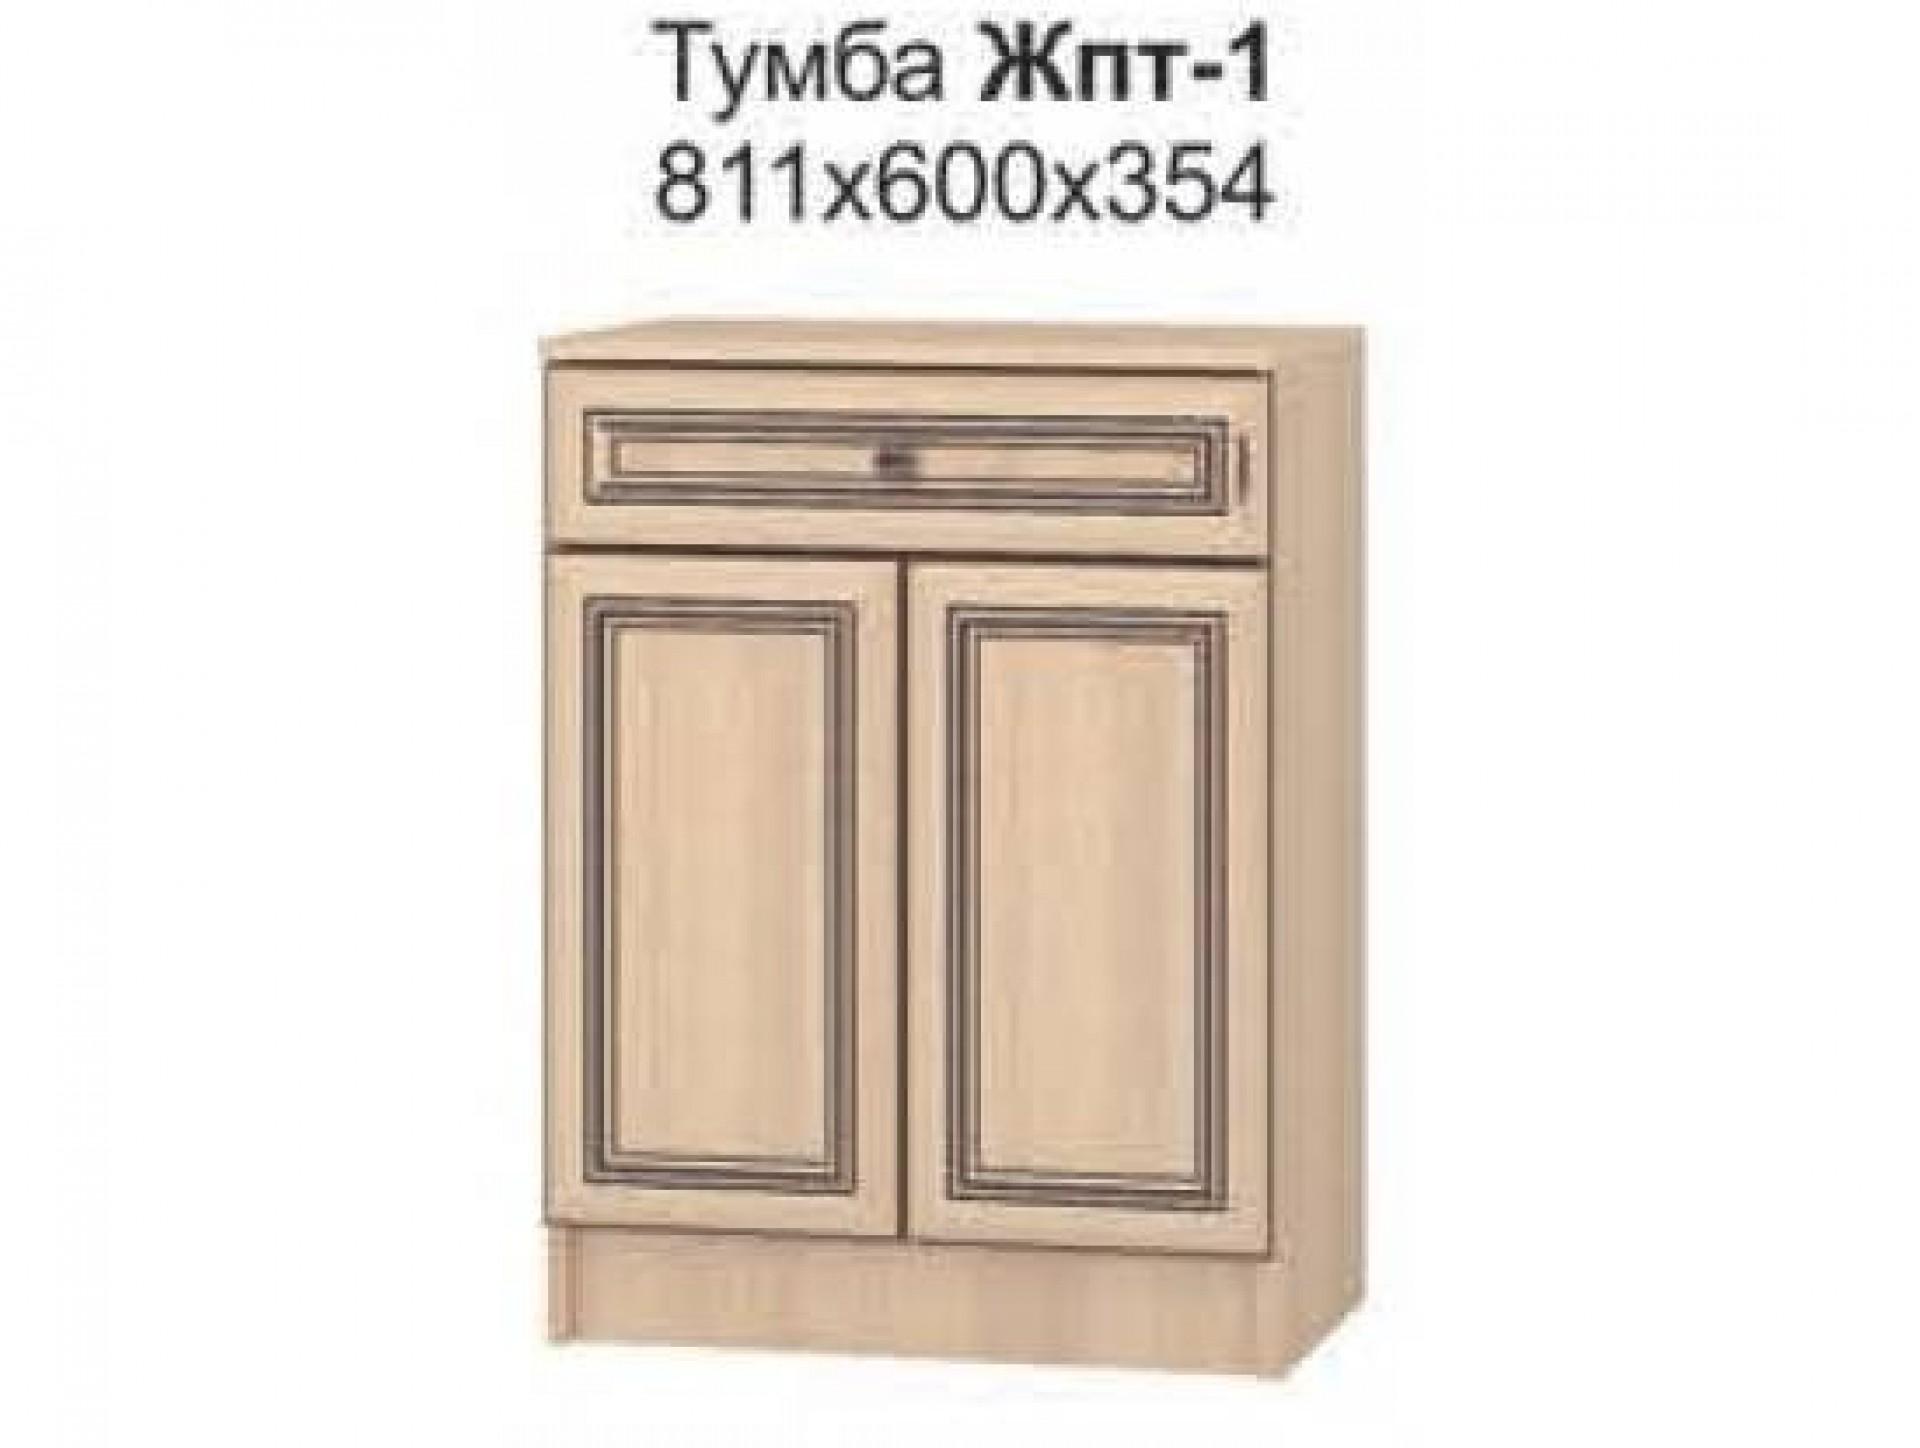 "Тумба ЖПТ-1 ""Жасмин"" приобрести в Томске"